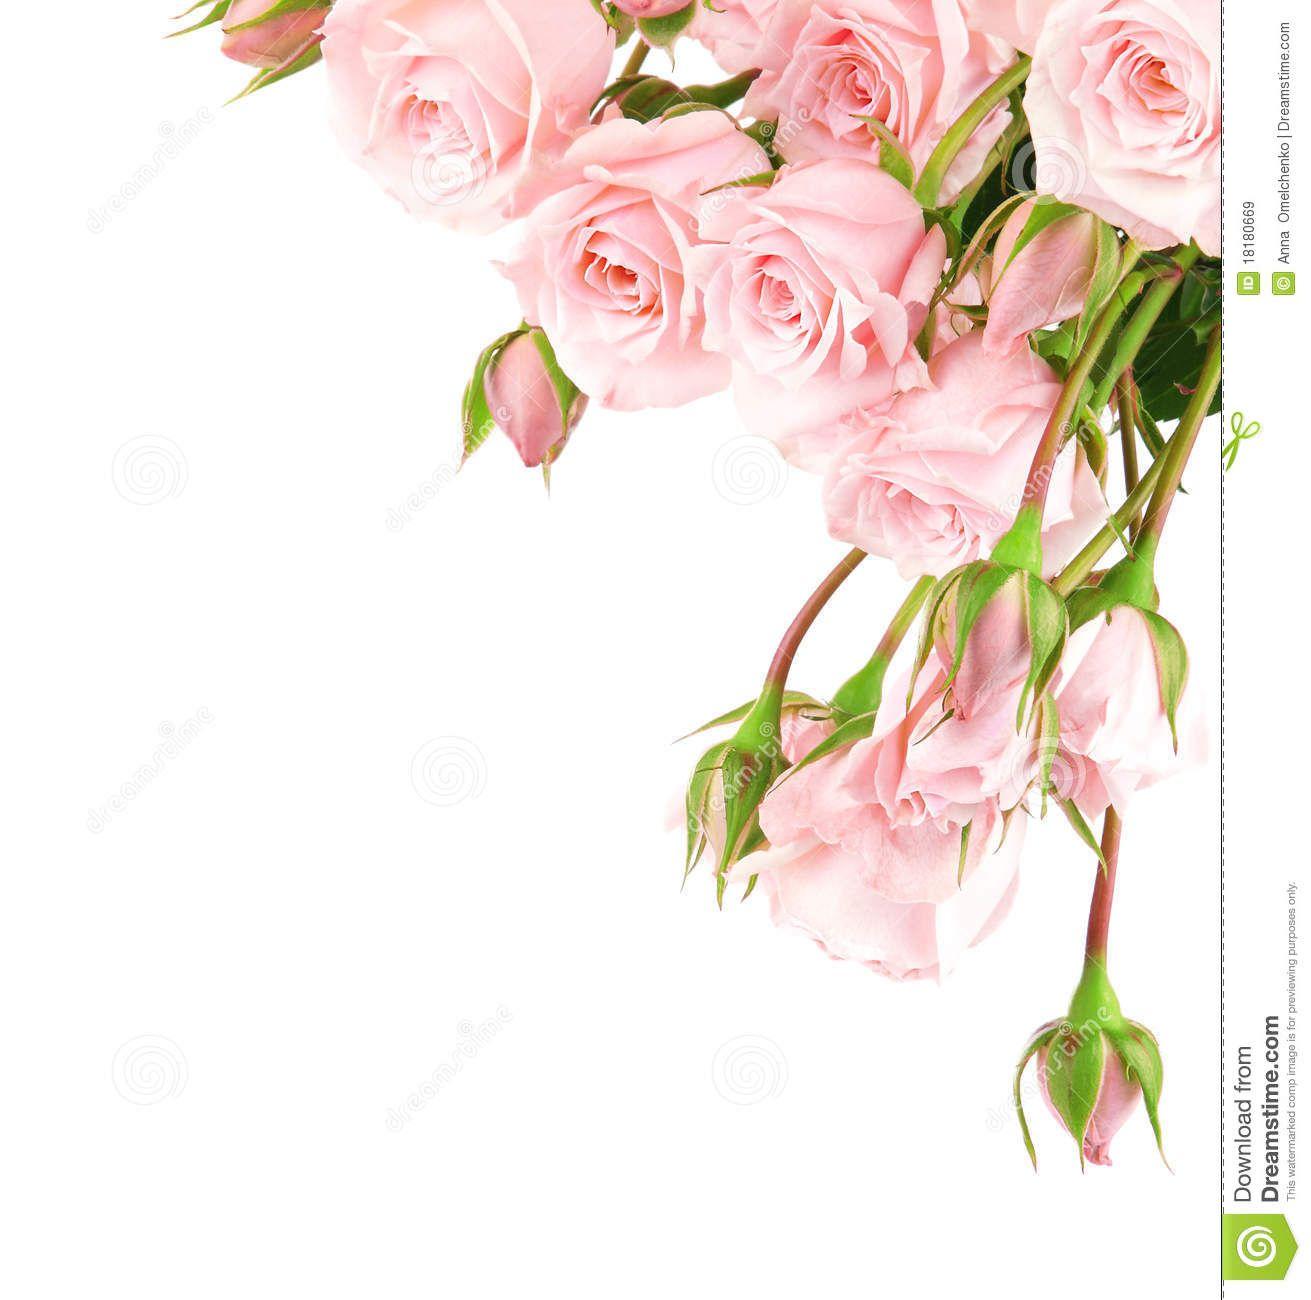 Pink Roses Border Clipart Fresh Pink Roses Border Flower Border Clipart Pink Roses Background Clip Art Borders